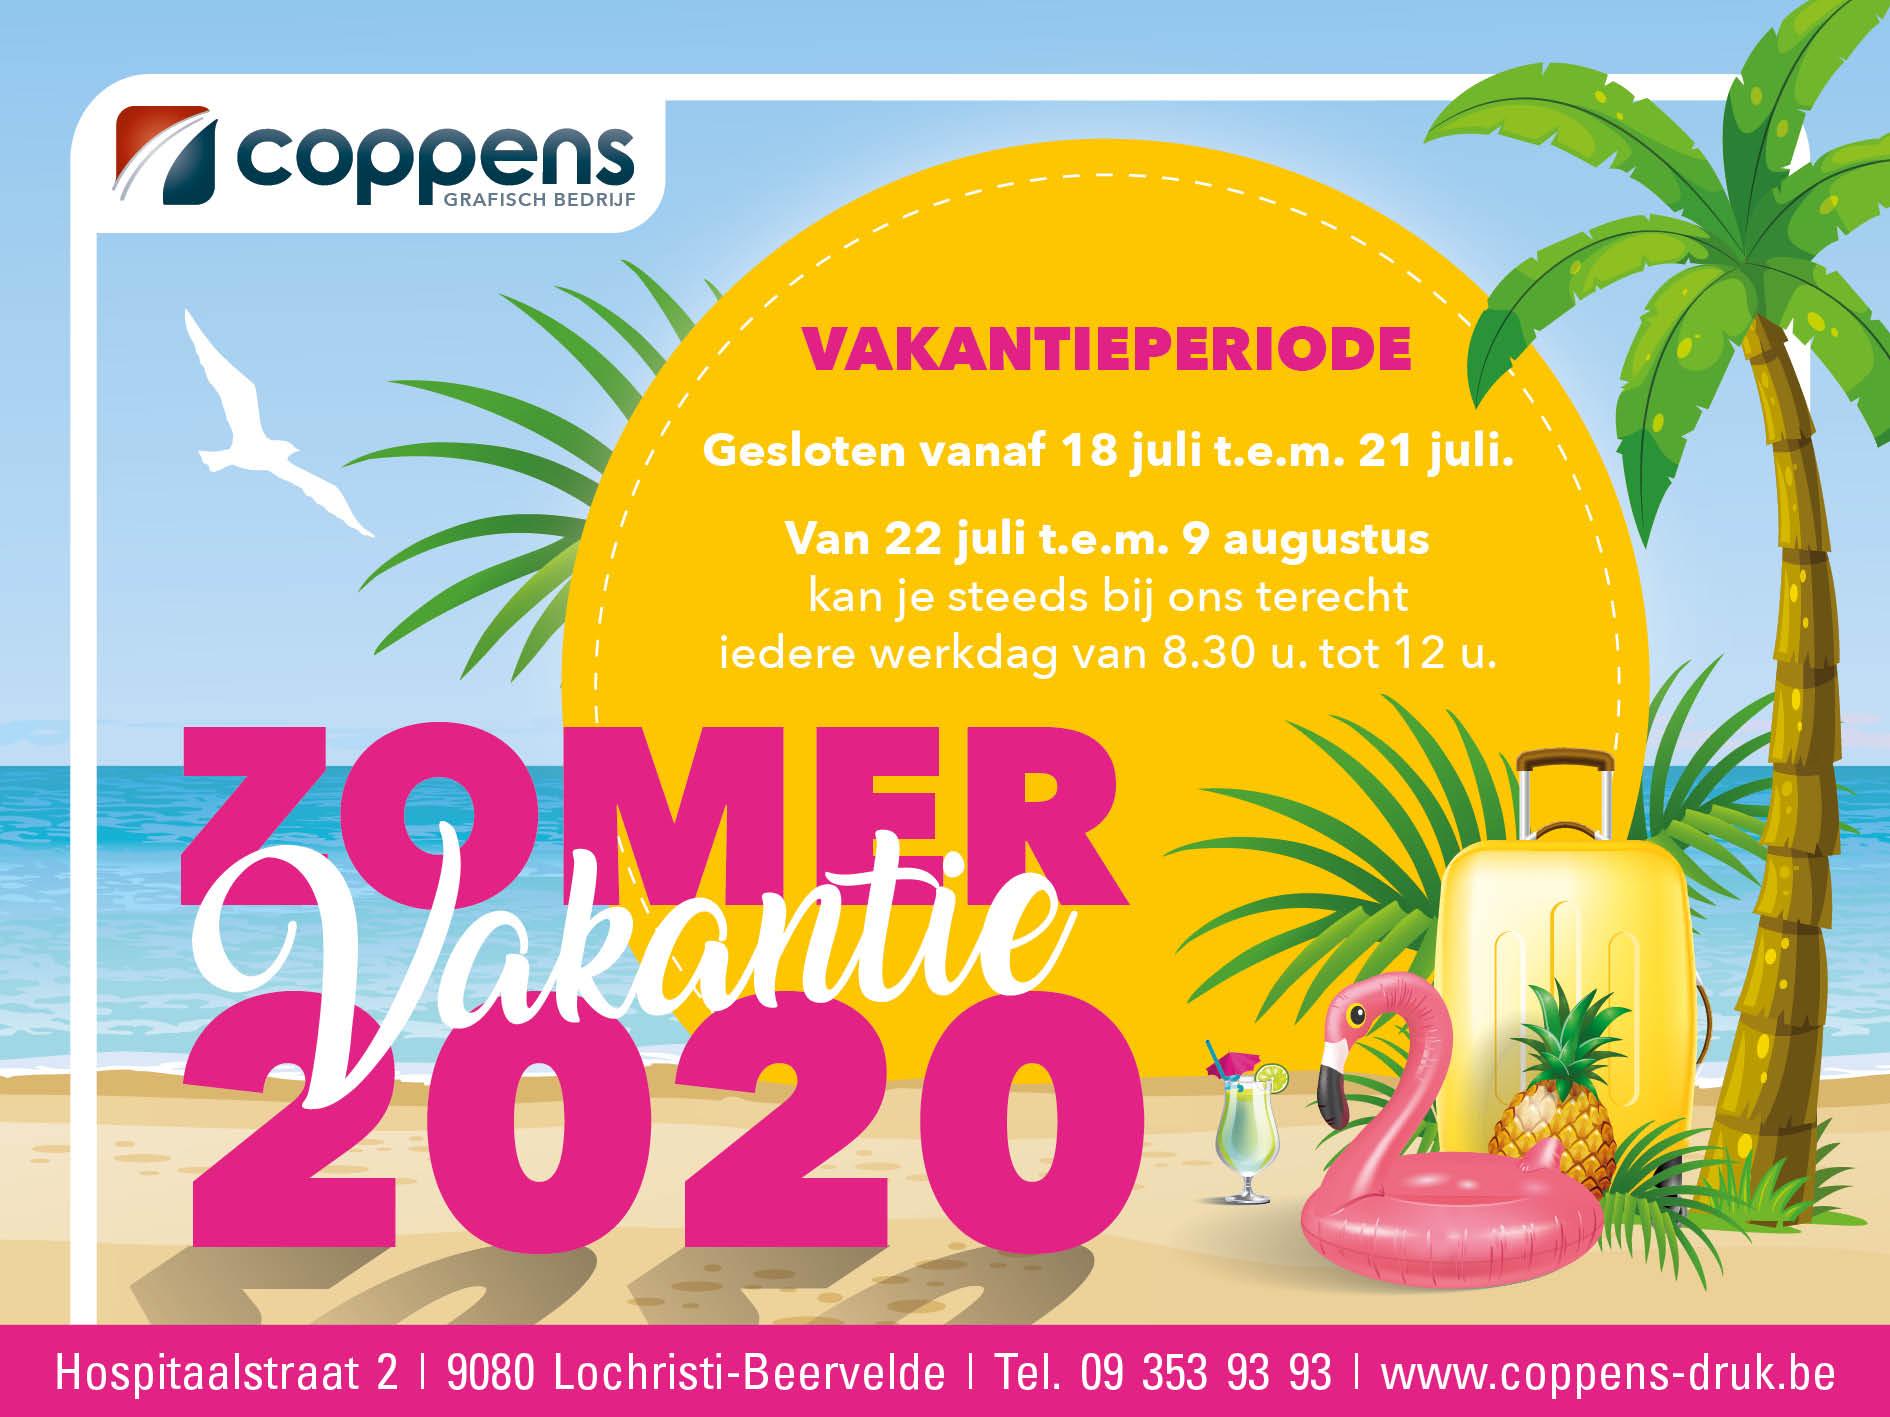 Vakantieperiode 2020